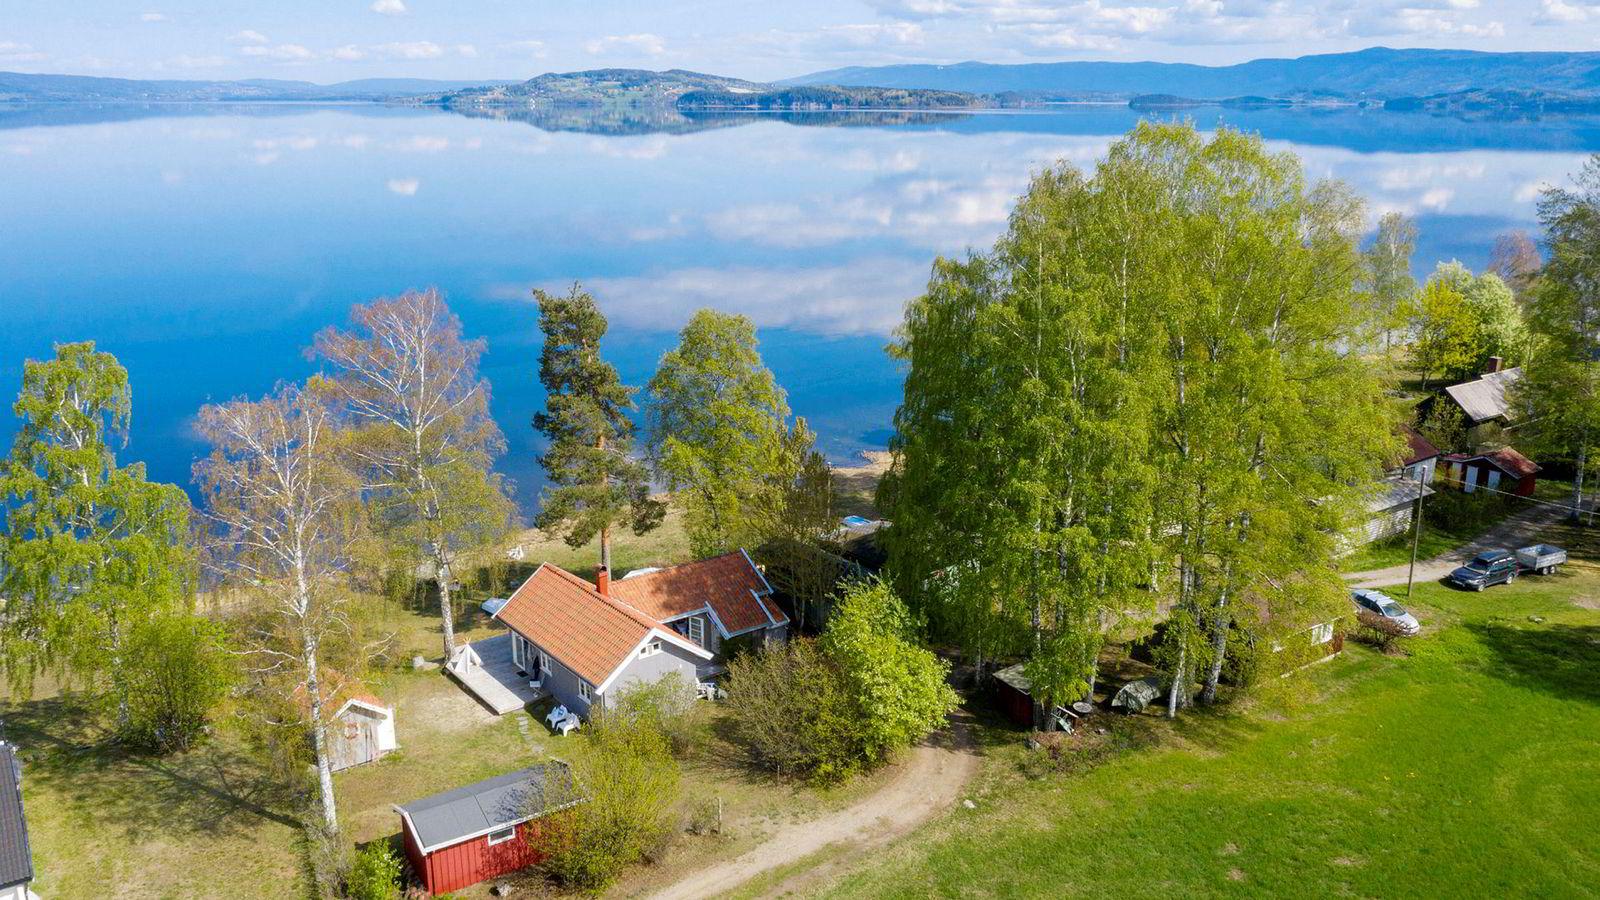 Den 70 kvadratmeter store hytta rett ved vannkanten ved Tyrifjorden har en prisantydning på 2,95 millioner kroner.